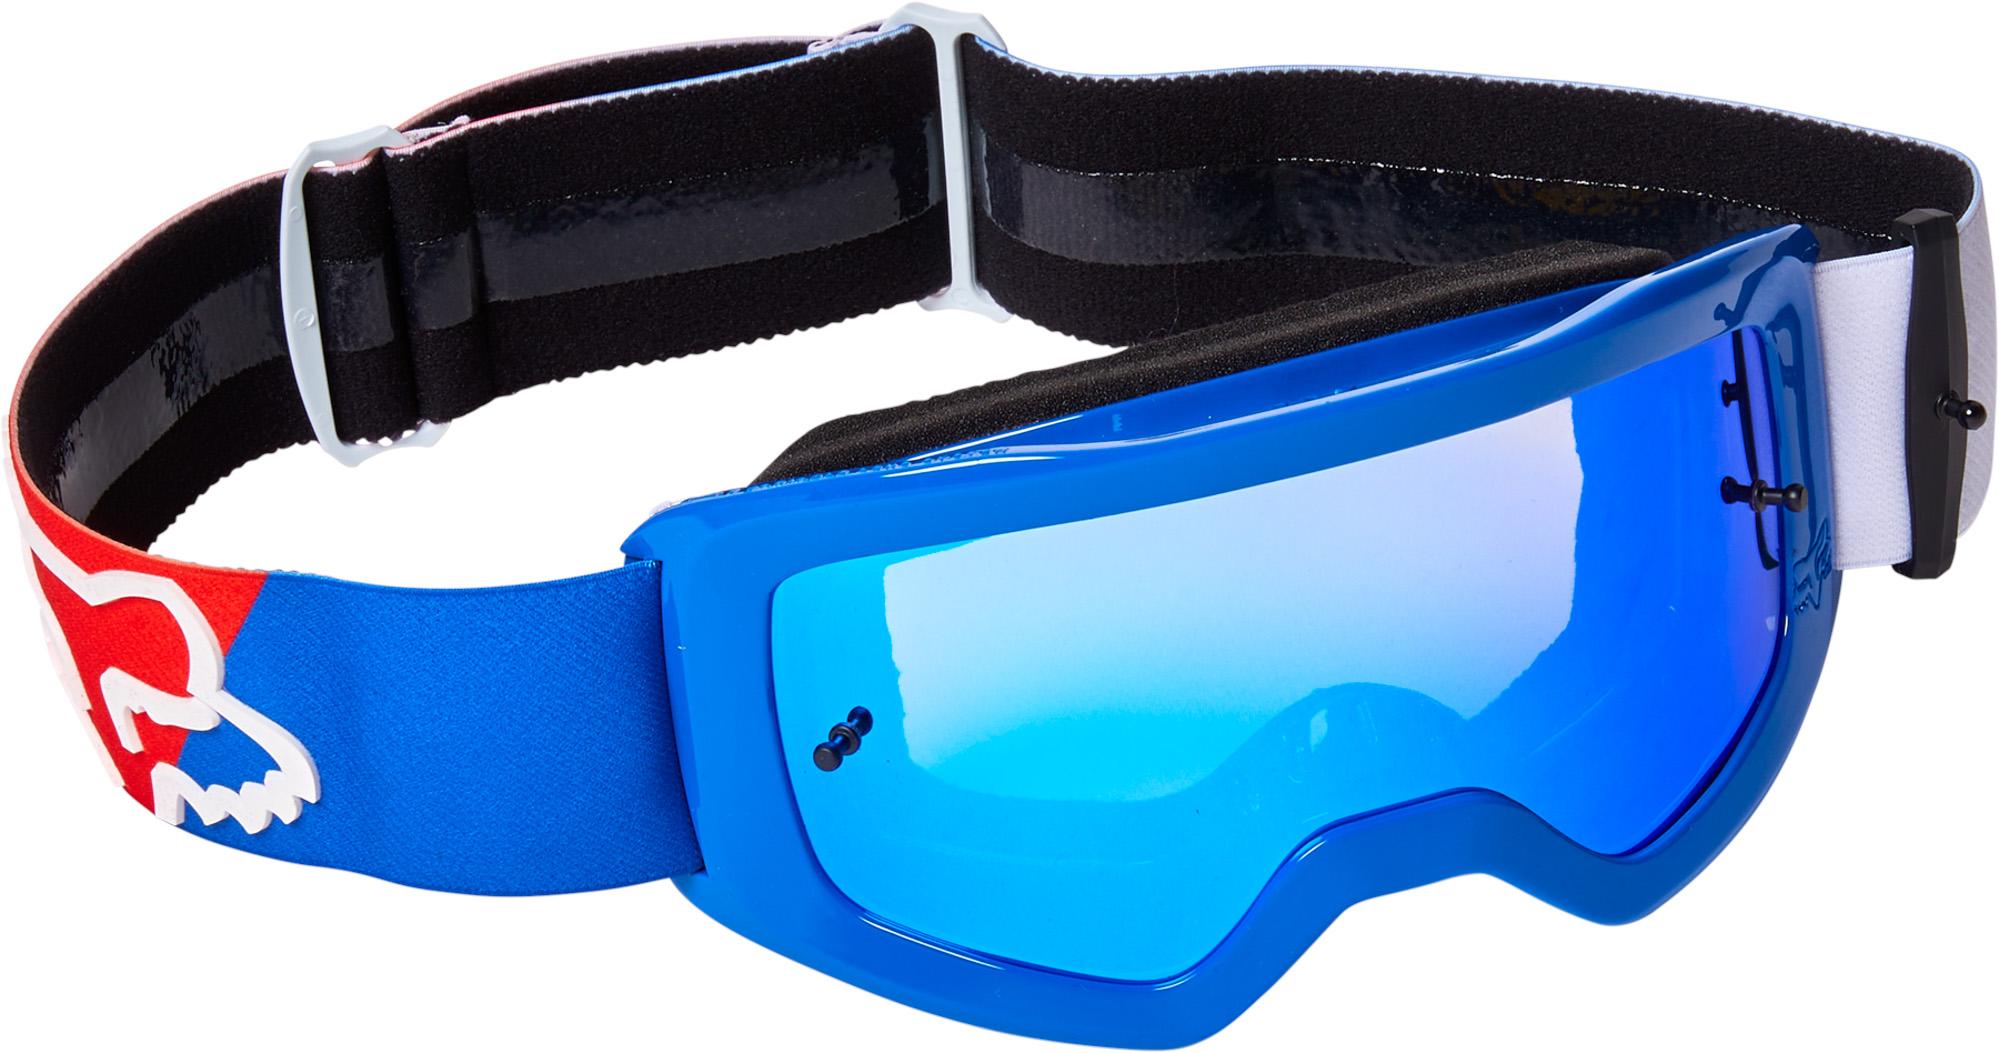 FOX Yth Main Skew Goggle Spk - OS, WHITE/RED/BLUE MX22